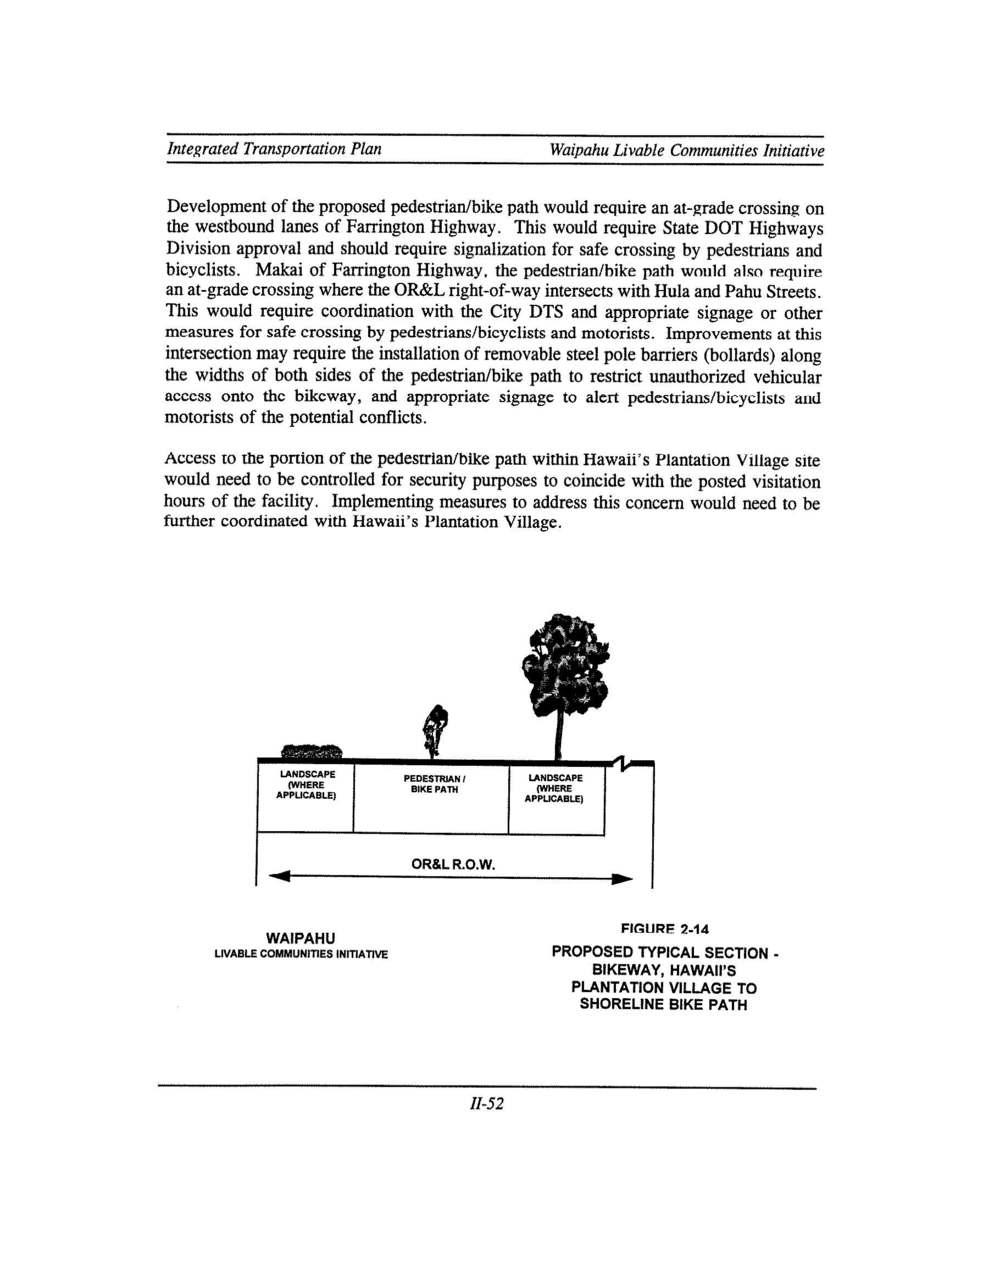 160531_WaipahuLivableCommunities(1998)_Page_067.jpg